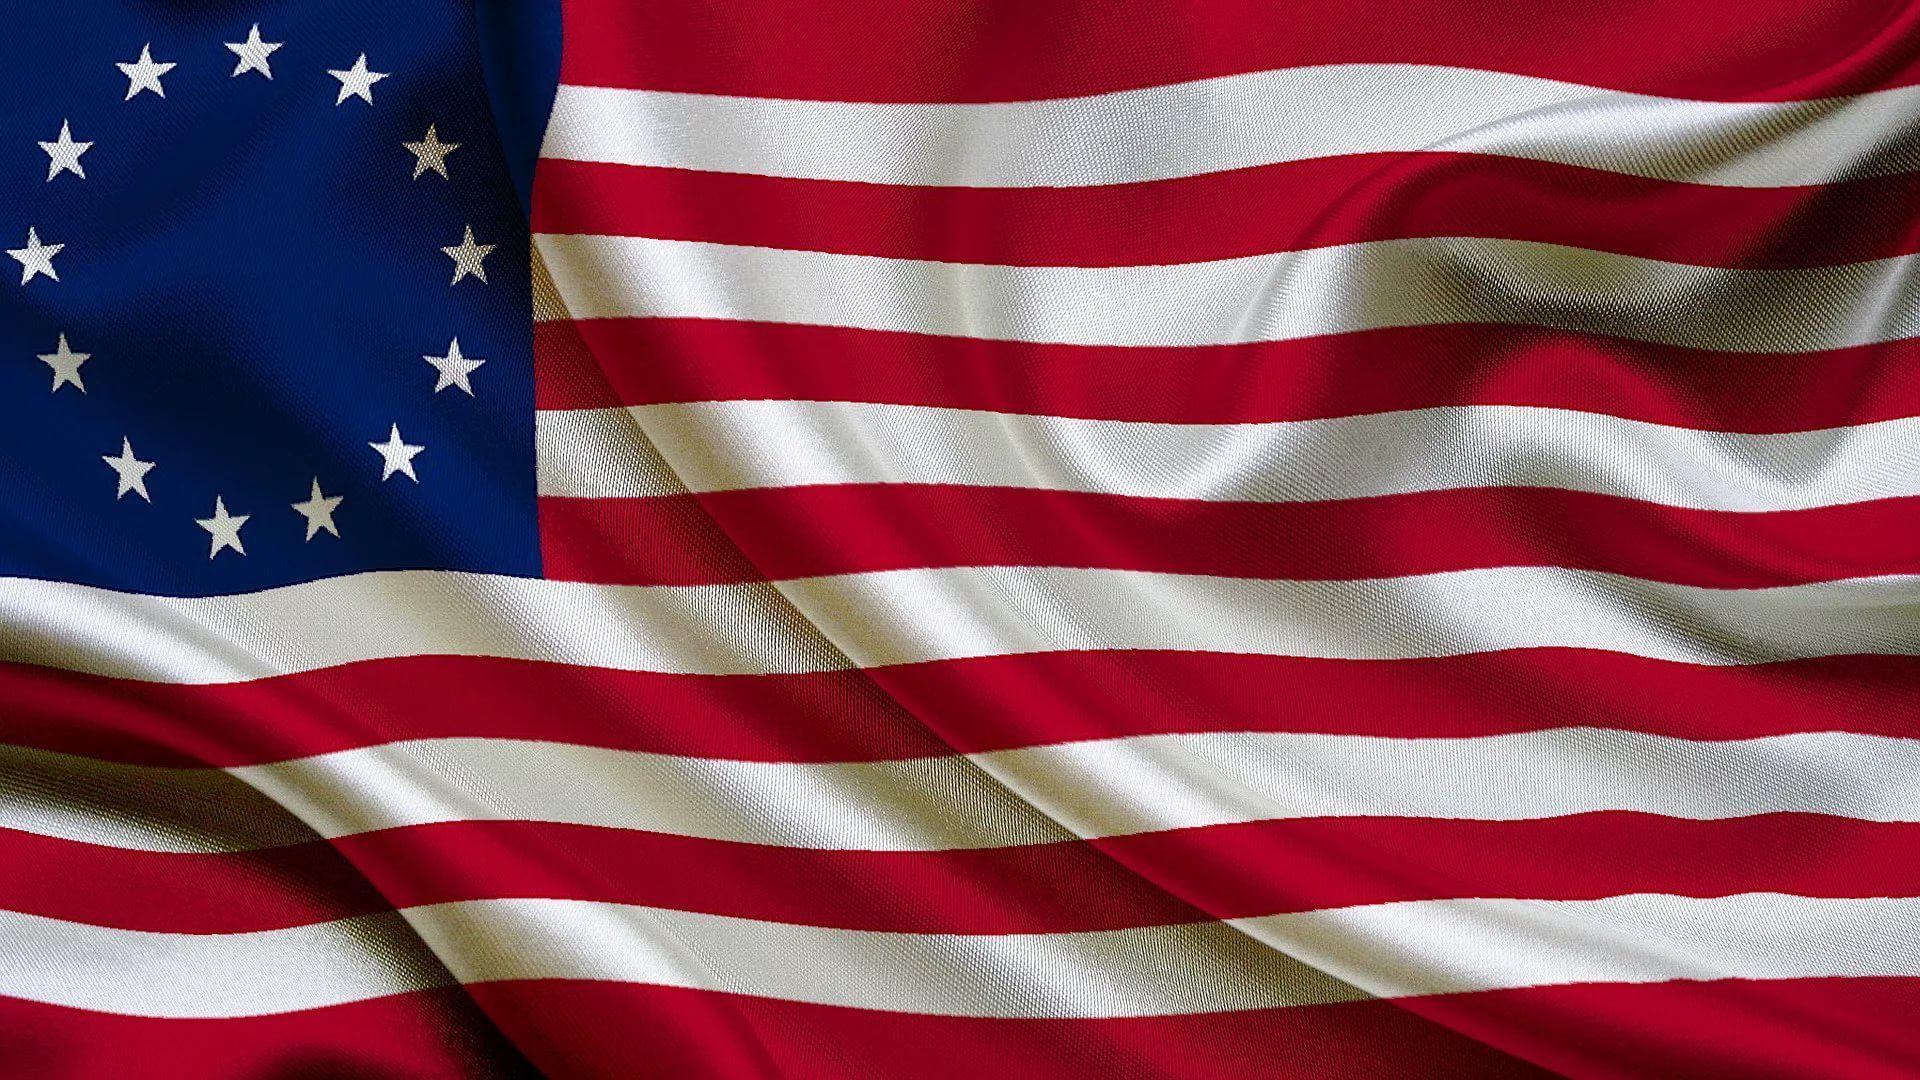 America Flag Good Wallpaper